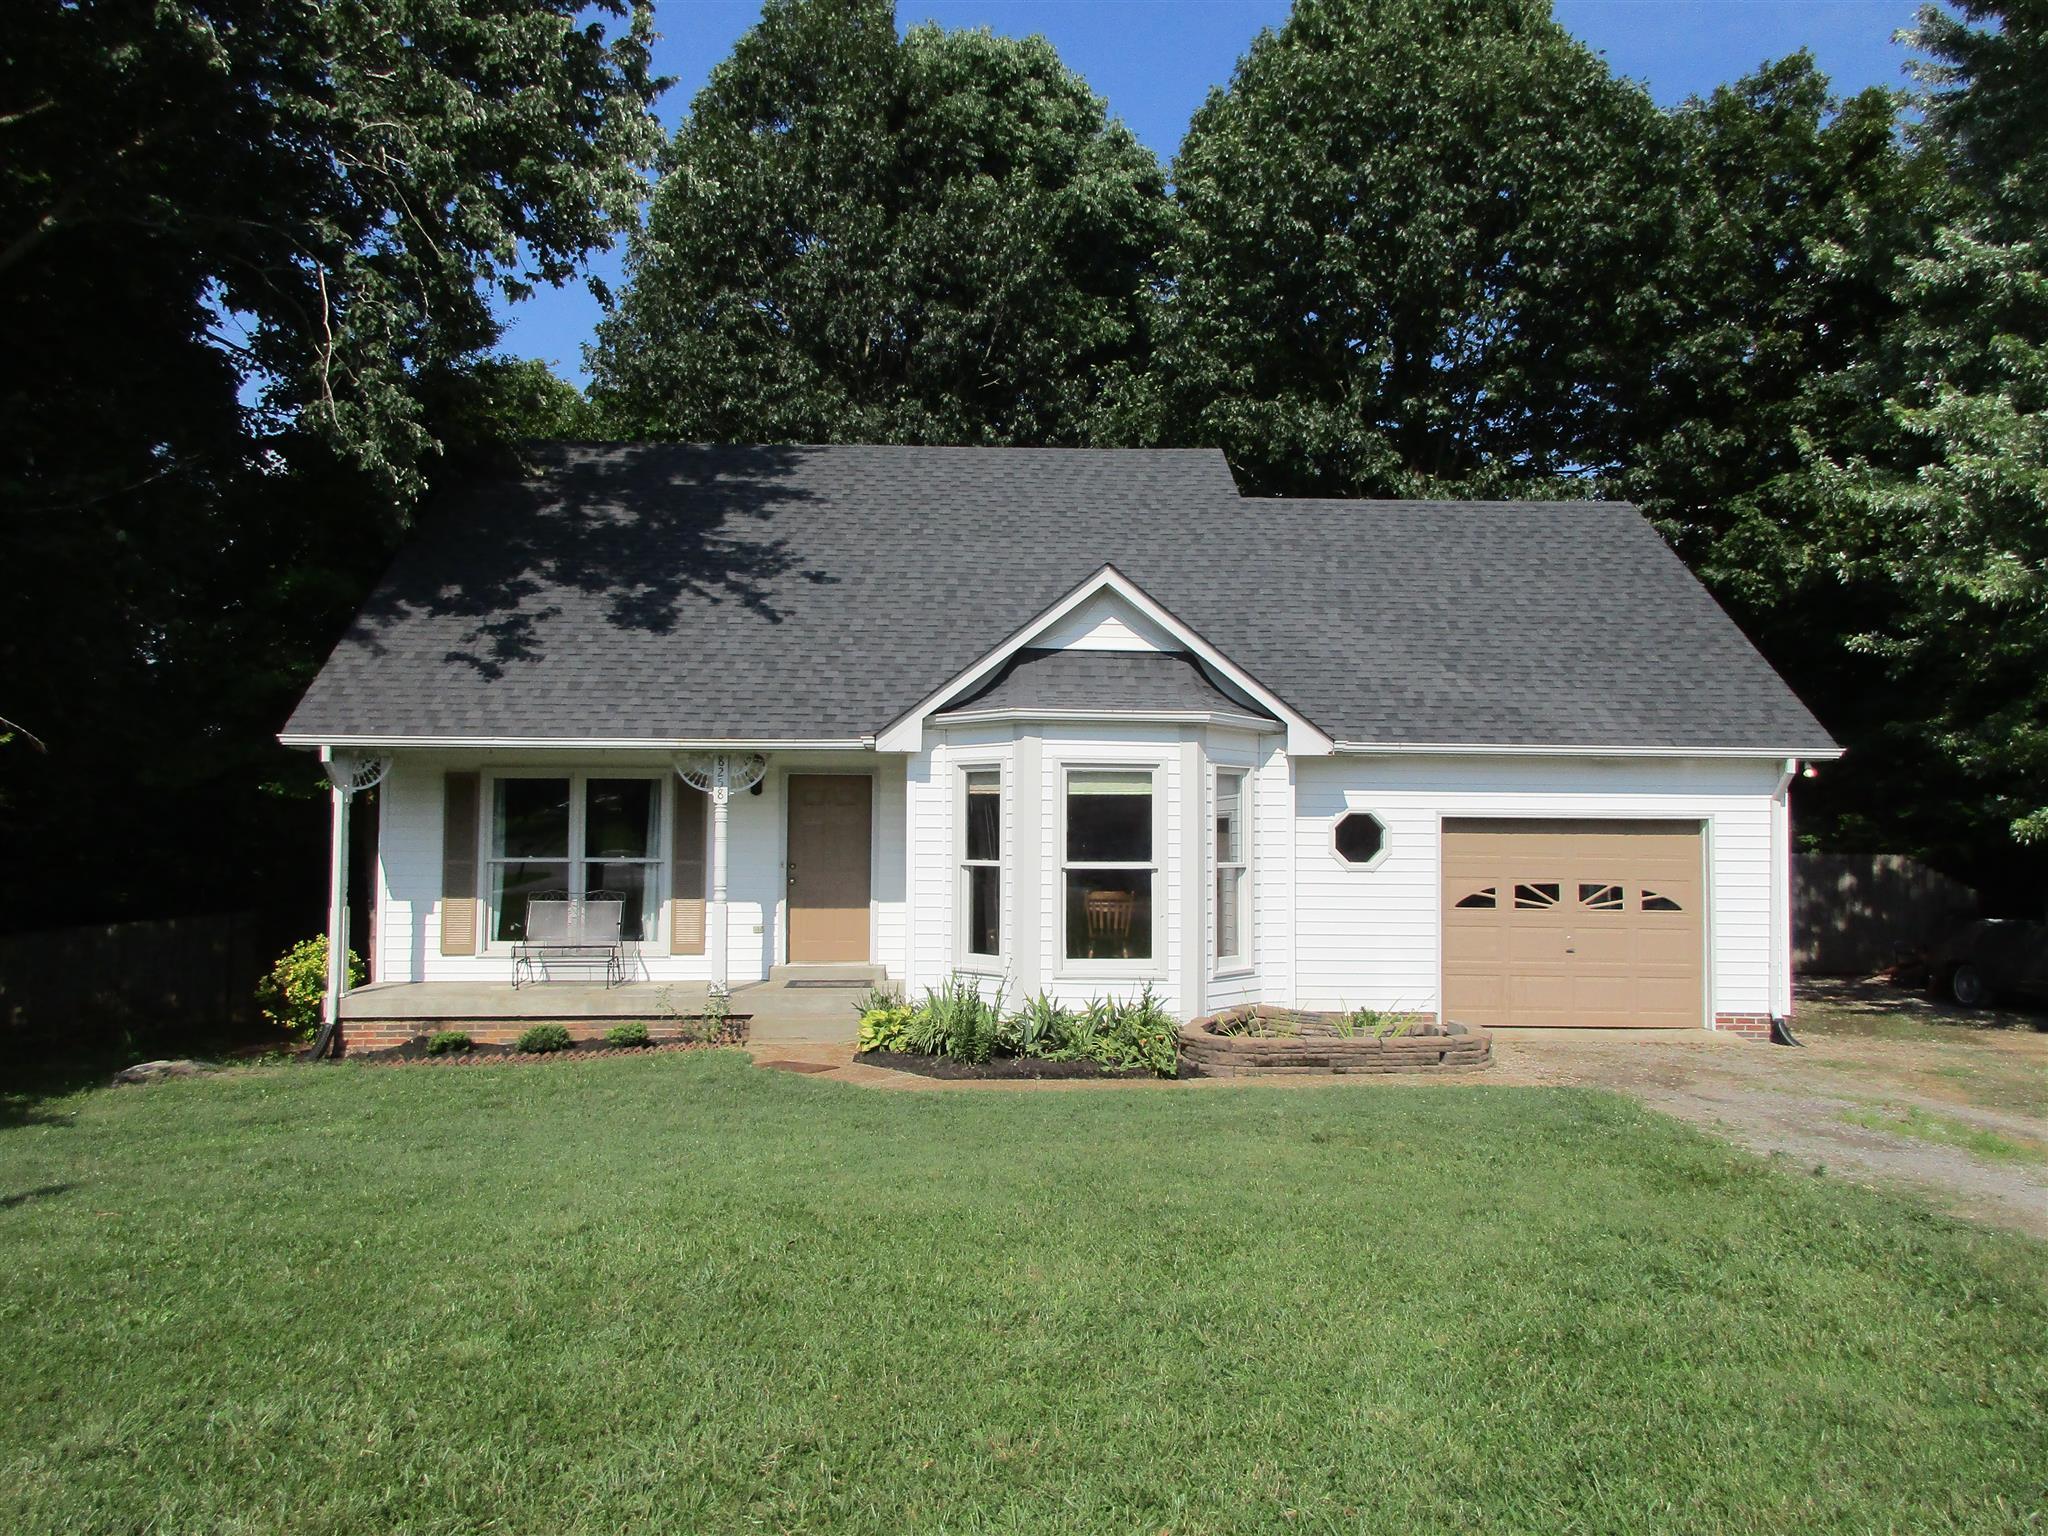 8258 Brownstone Ext, Cross Plains, TN 37049